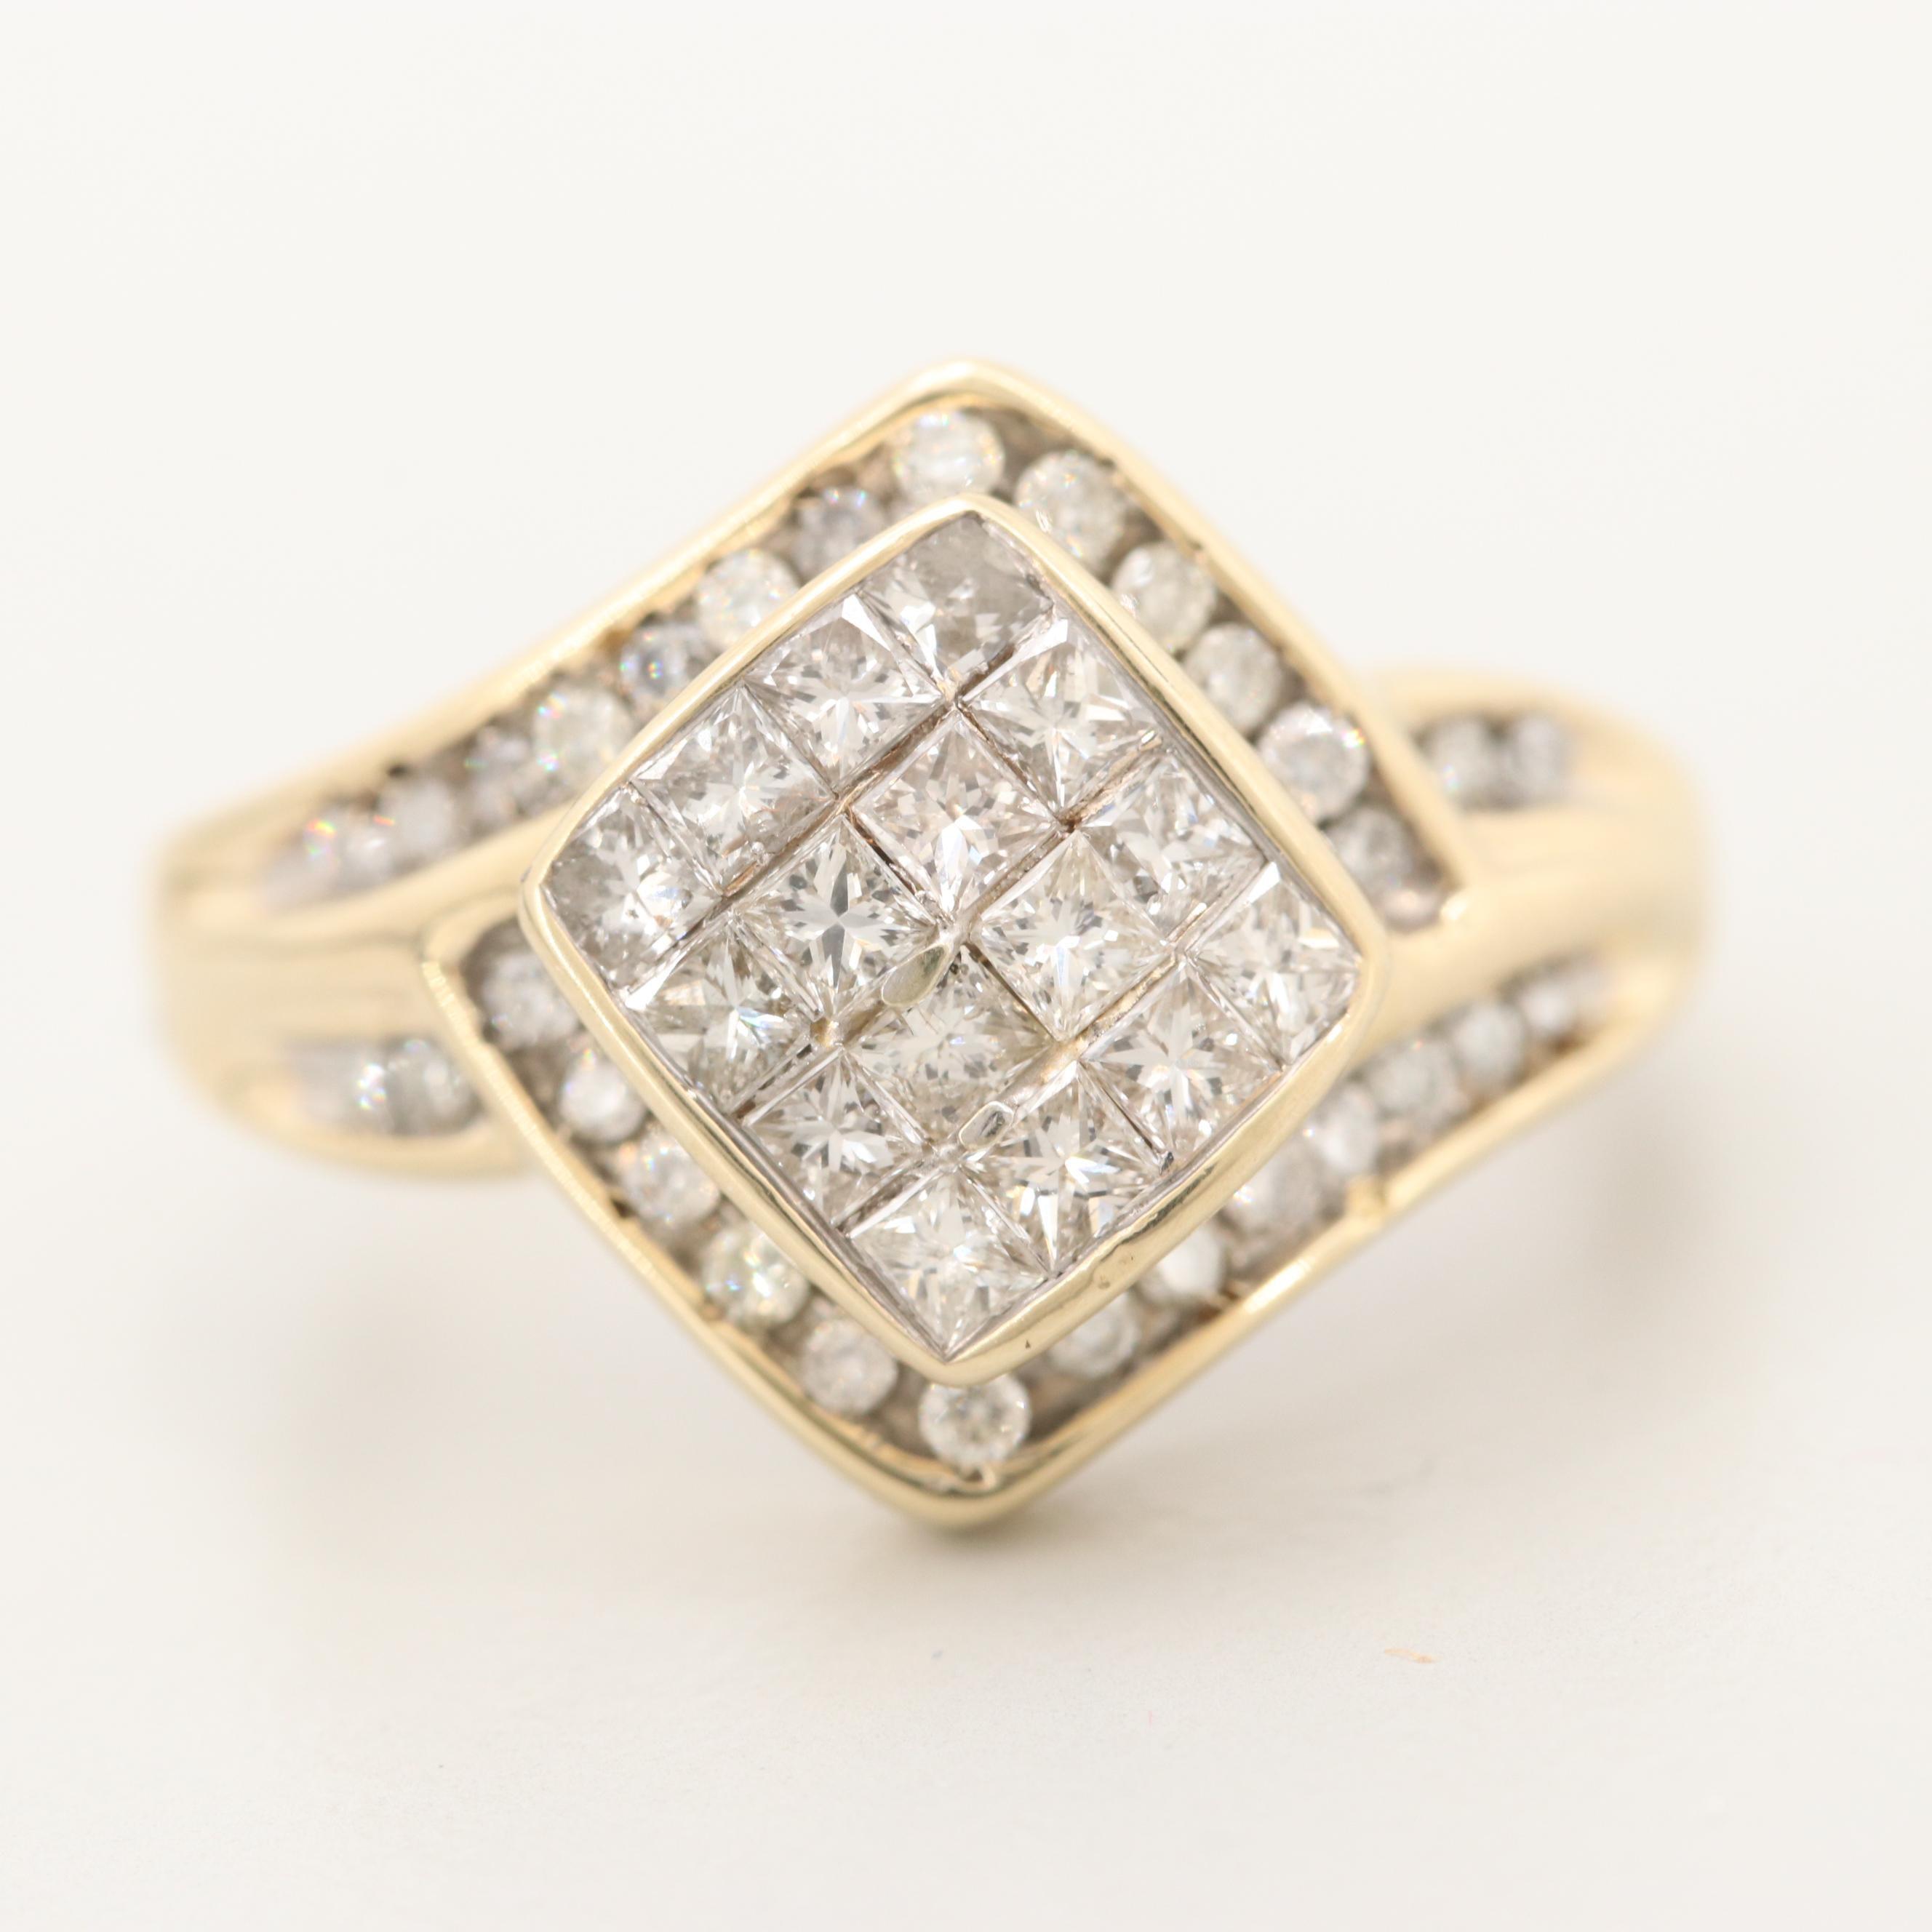 10K Yellow Gold 1.02 CTW Diamond Ring